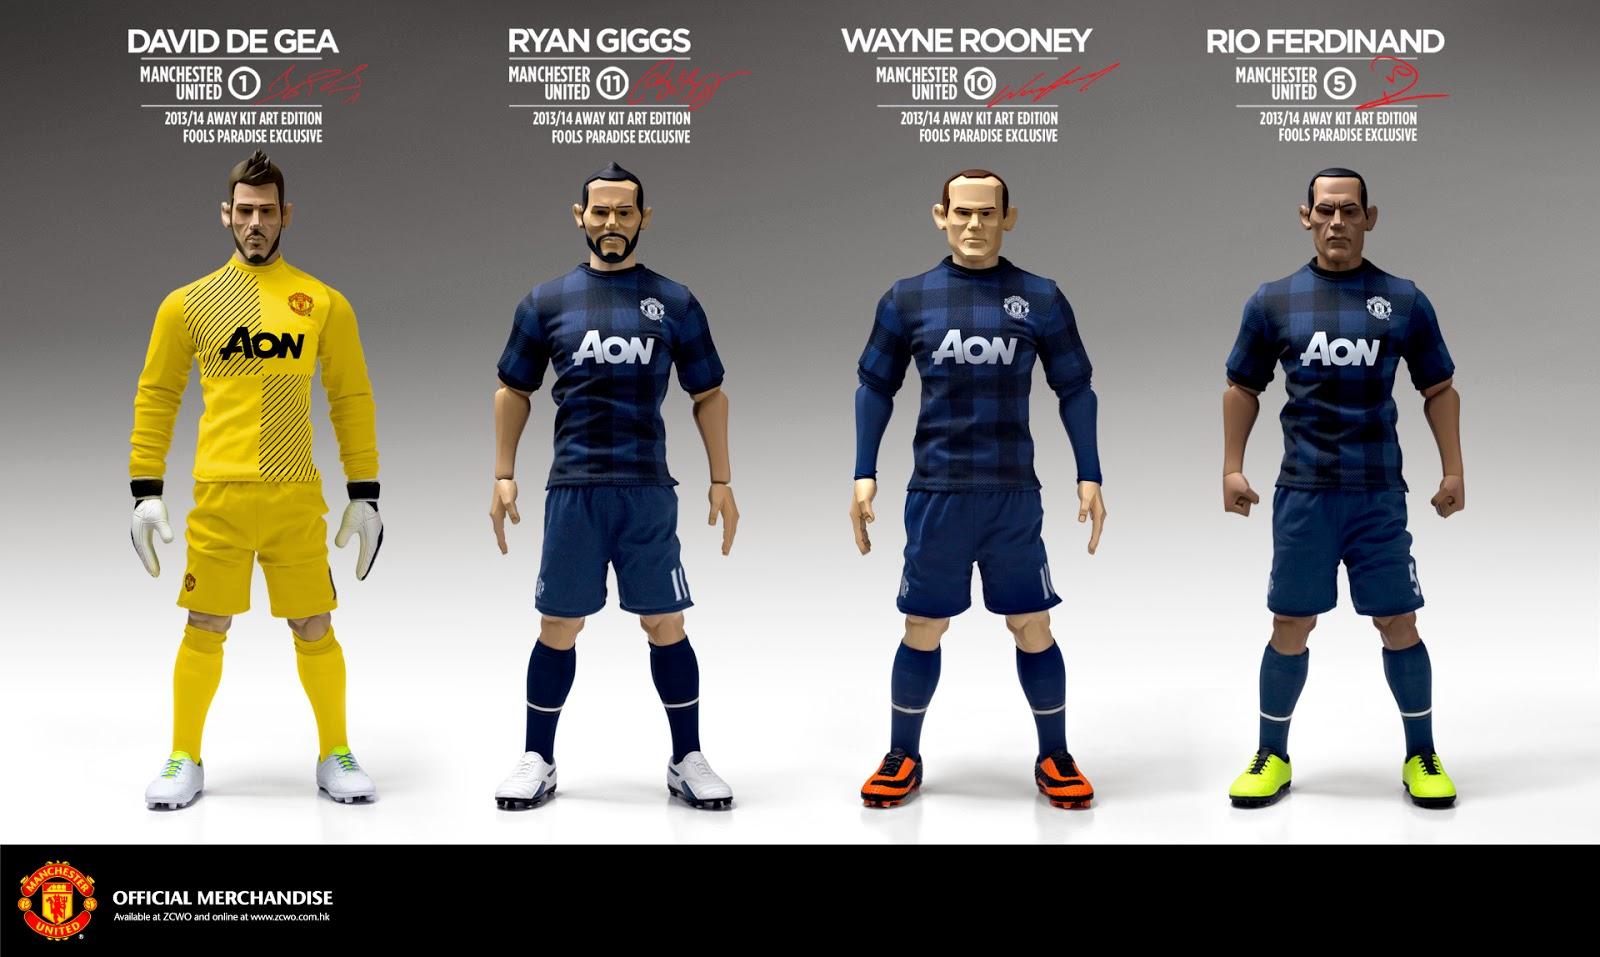 c8cc01ebe42 Fools Paradise Blog: Manchester United 1:6 Art Edition 2013/14 Away ...